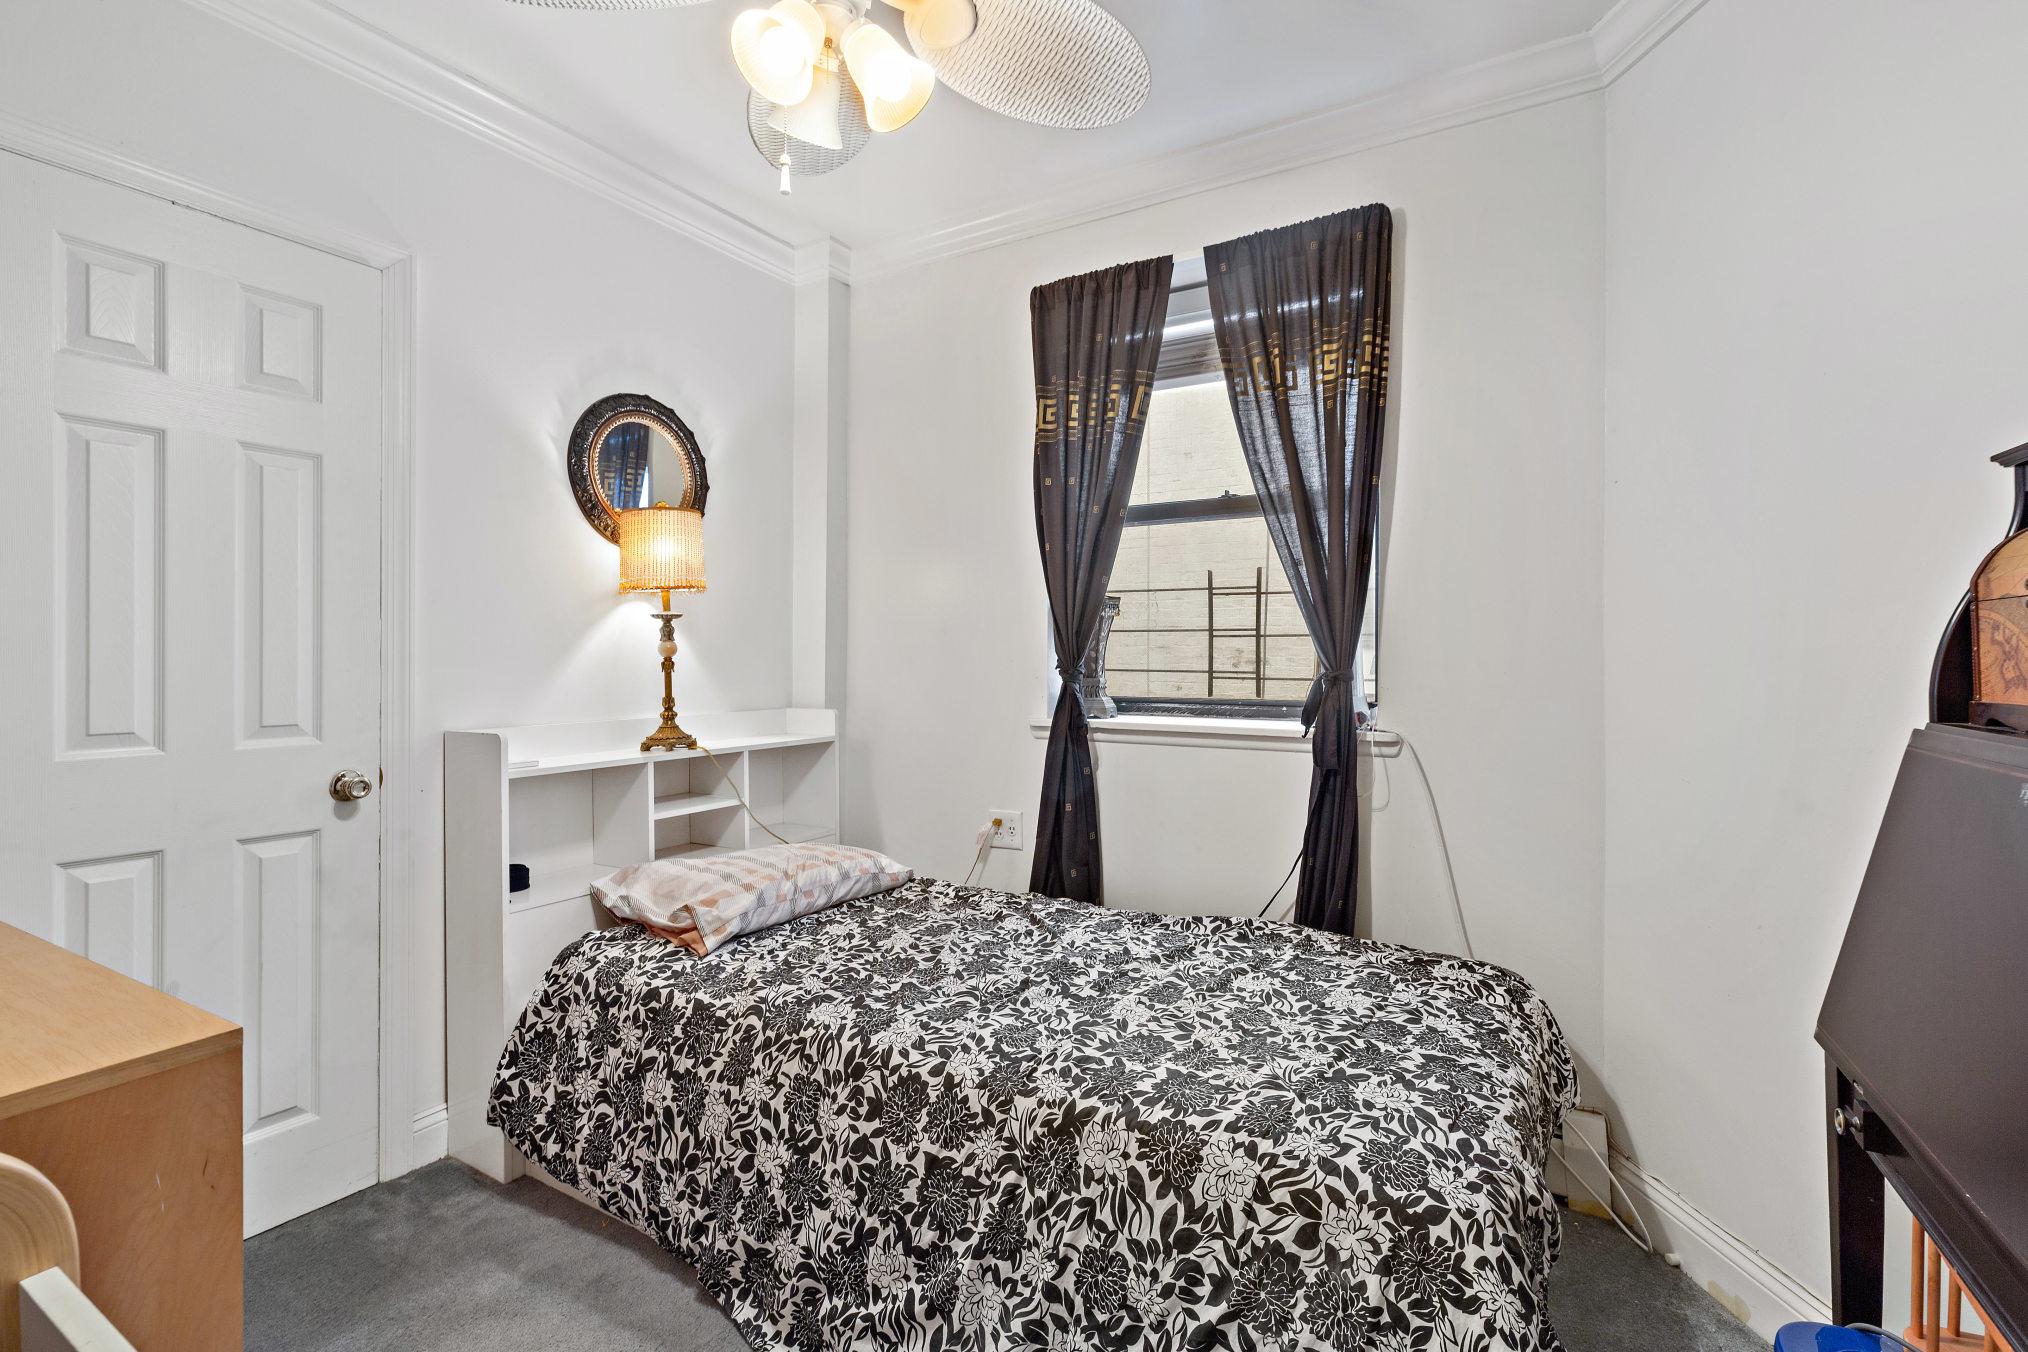 319 East 105th Street East Harlem New York NY 10029